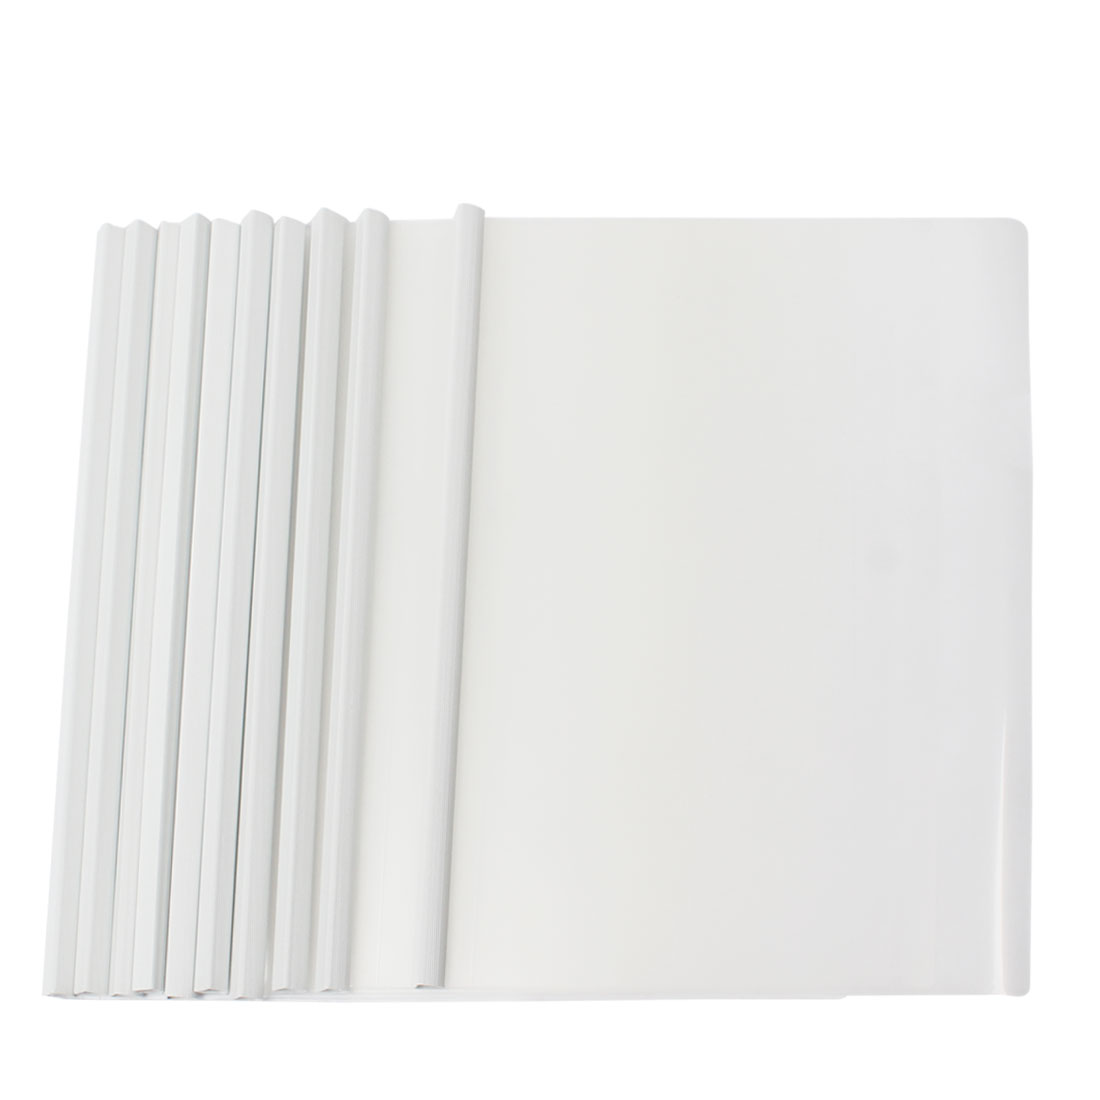 10 Pcs Gray Plastic Sliding Bar File Folder for A4 Paper Report